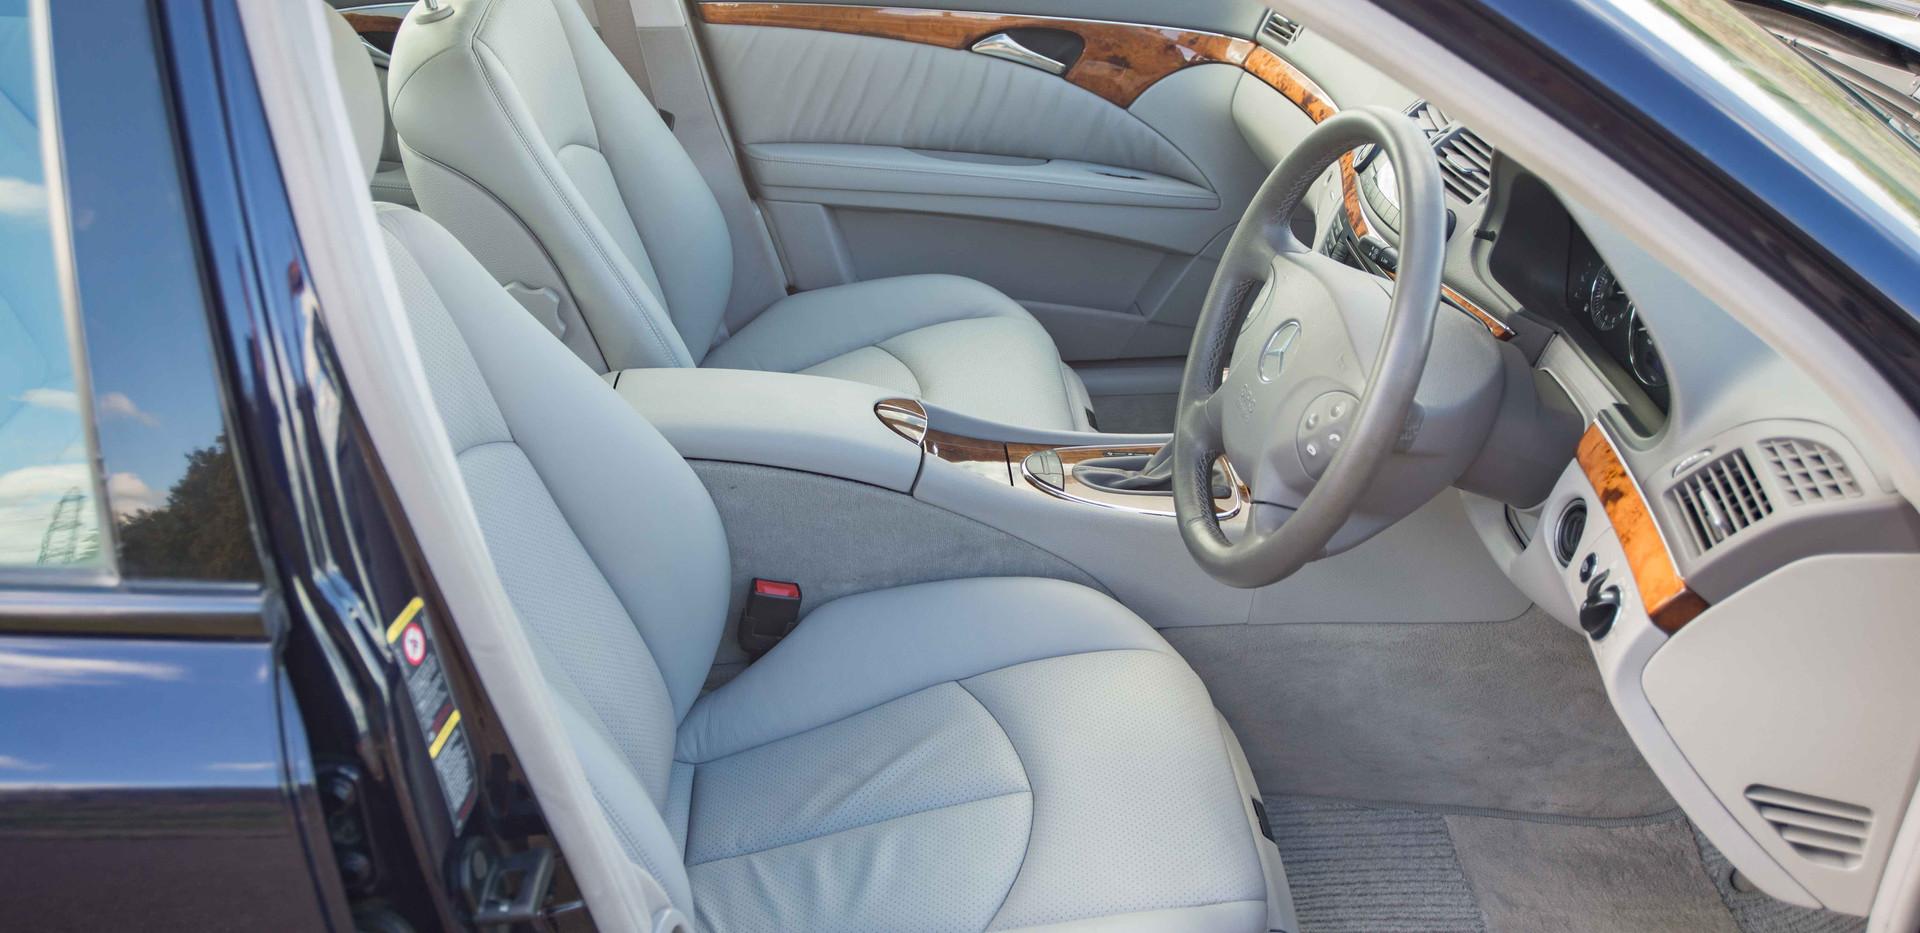 Mercedes E500 For Sale UK London  (32 of